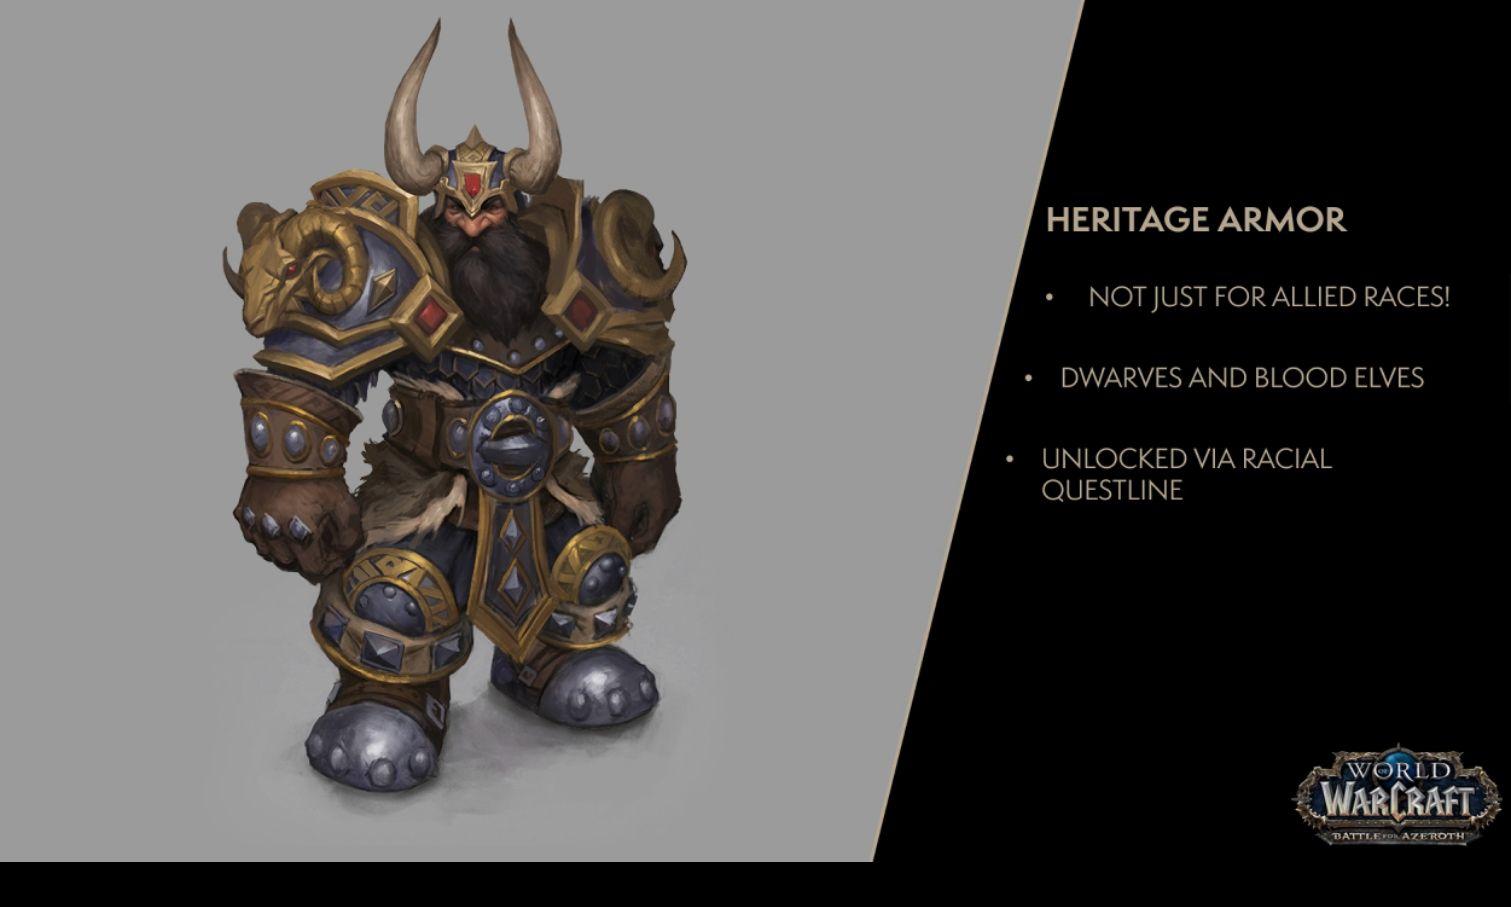 WoW Dwarf Heritage Armor Concept